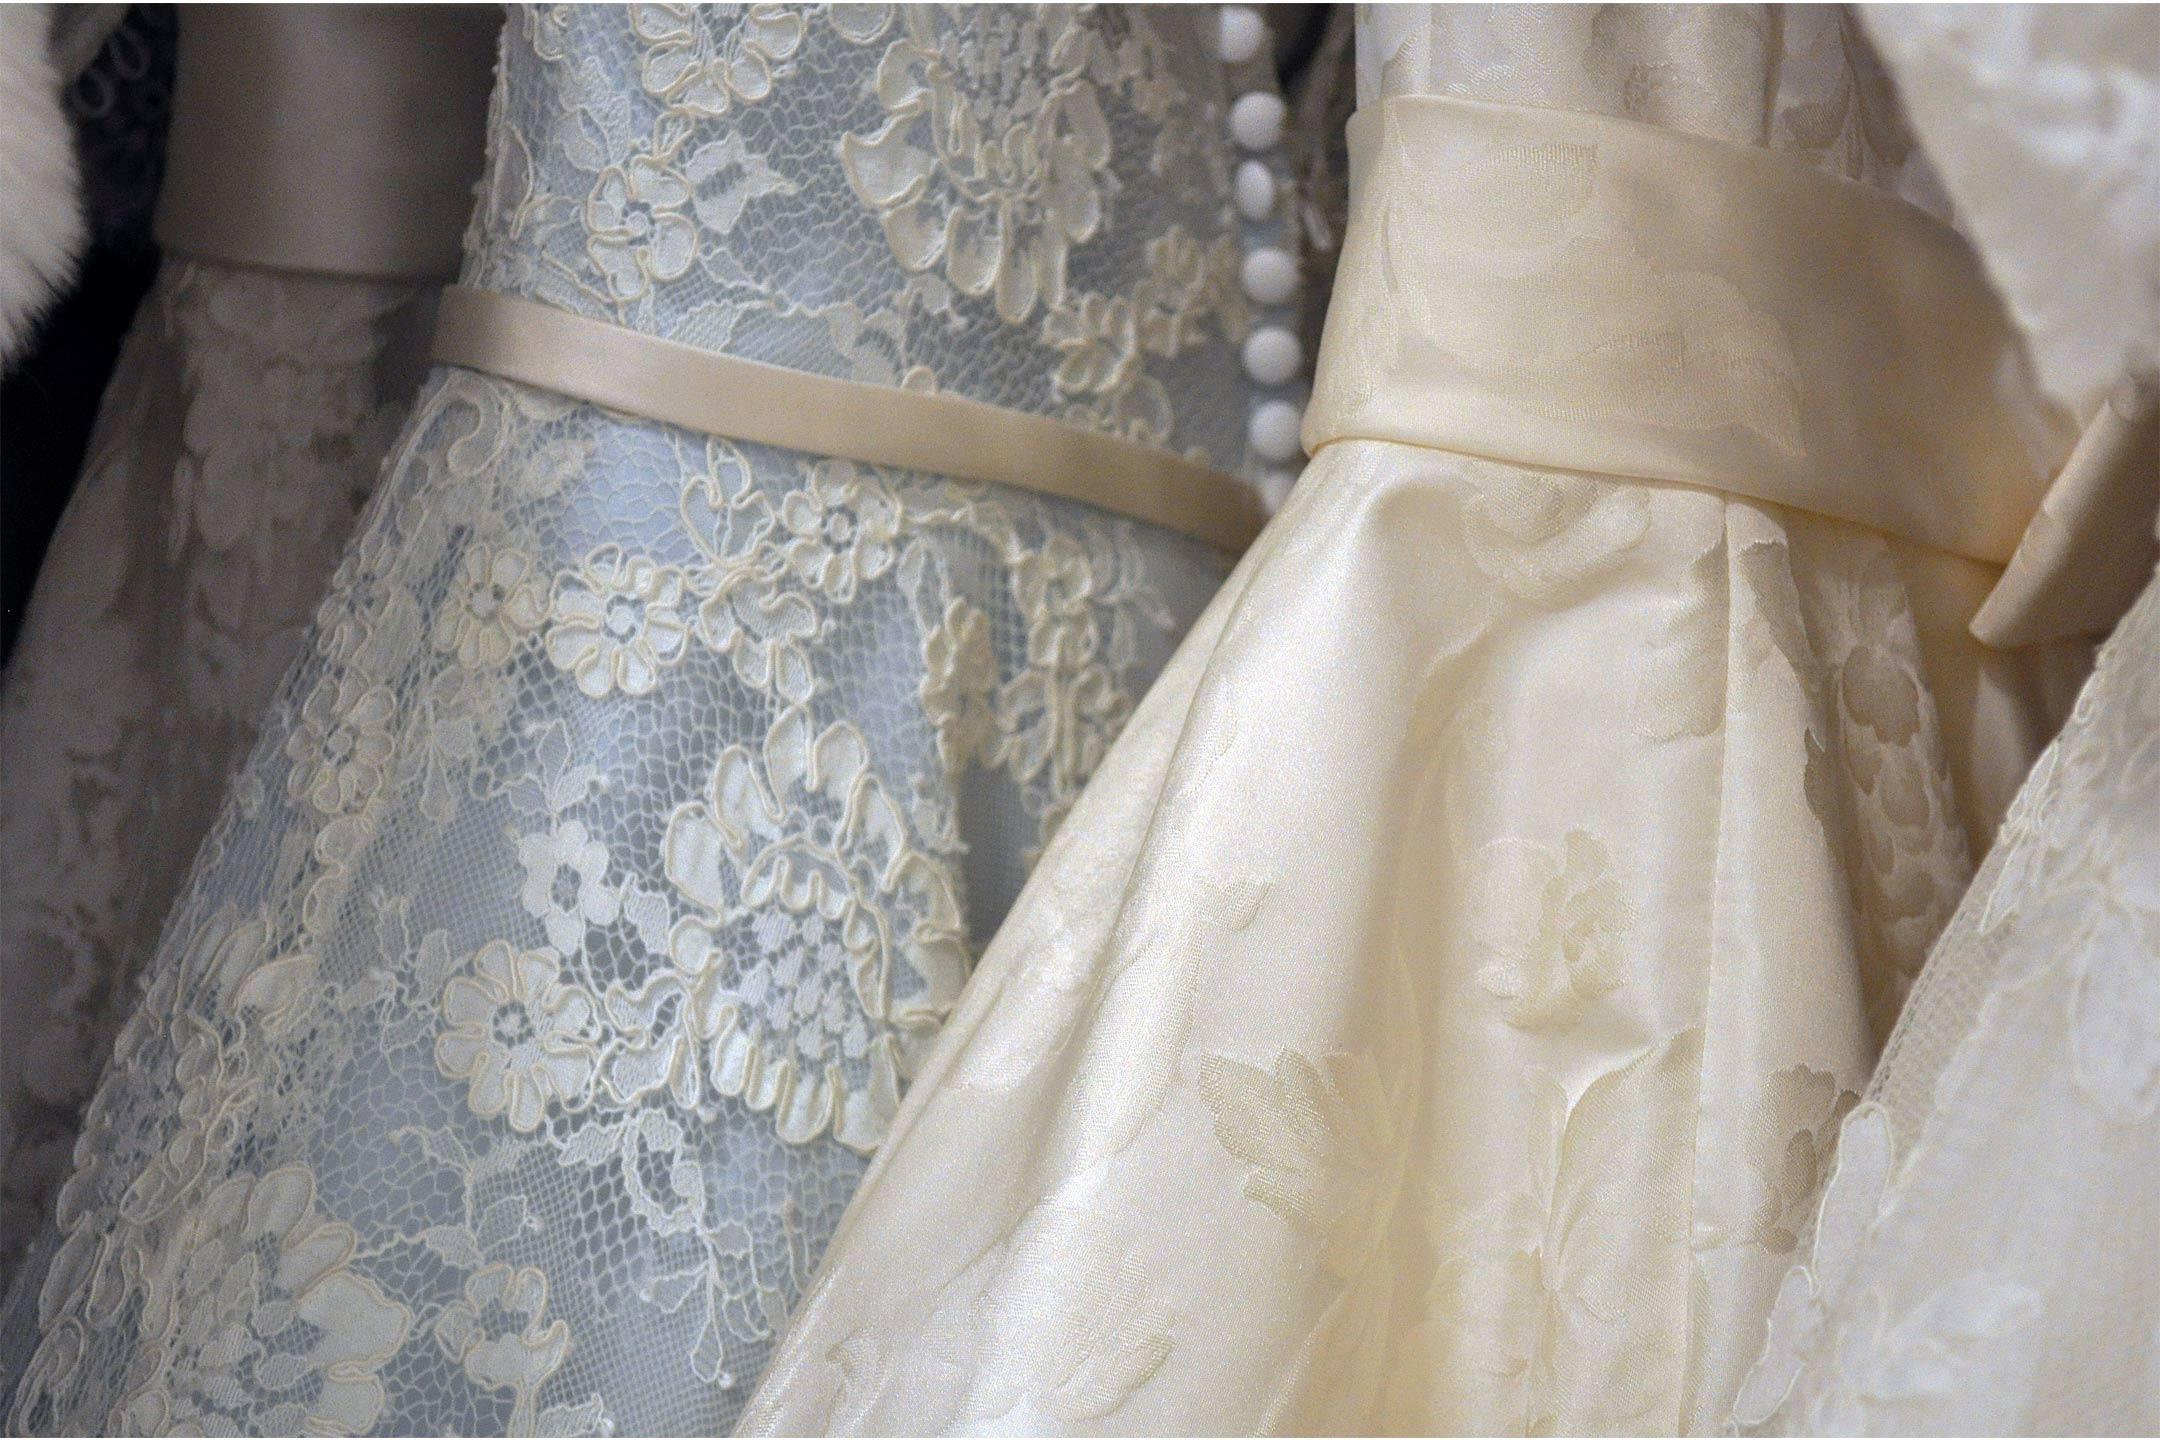 Donate Wedding Dress.Brides Donate Wedding Dresses To Make Angel Gowns